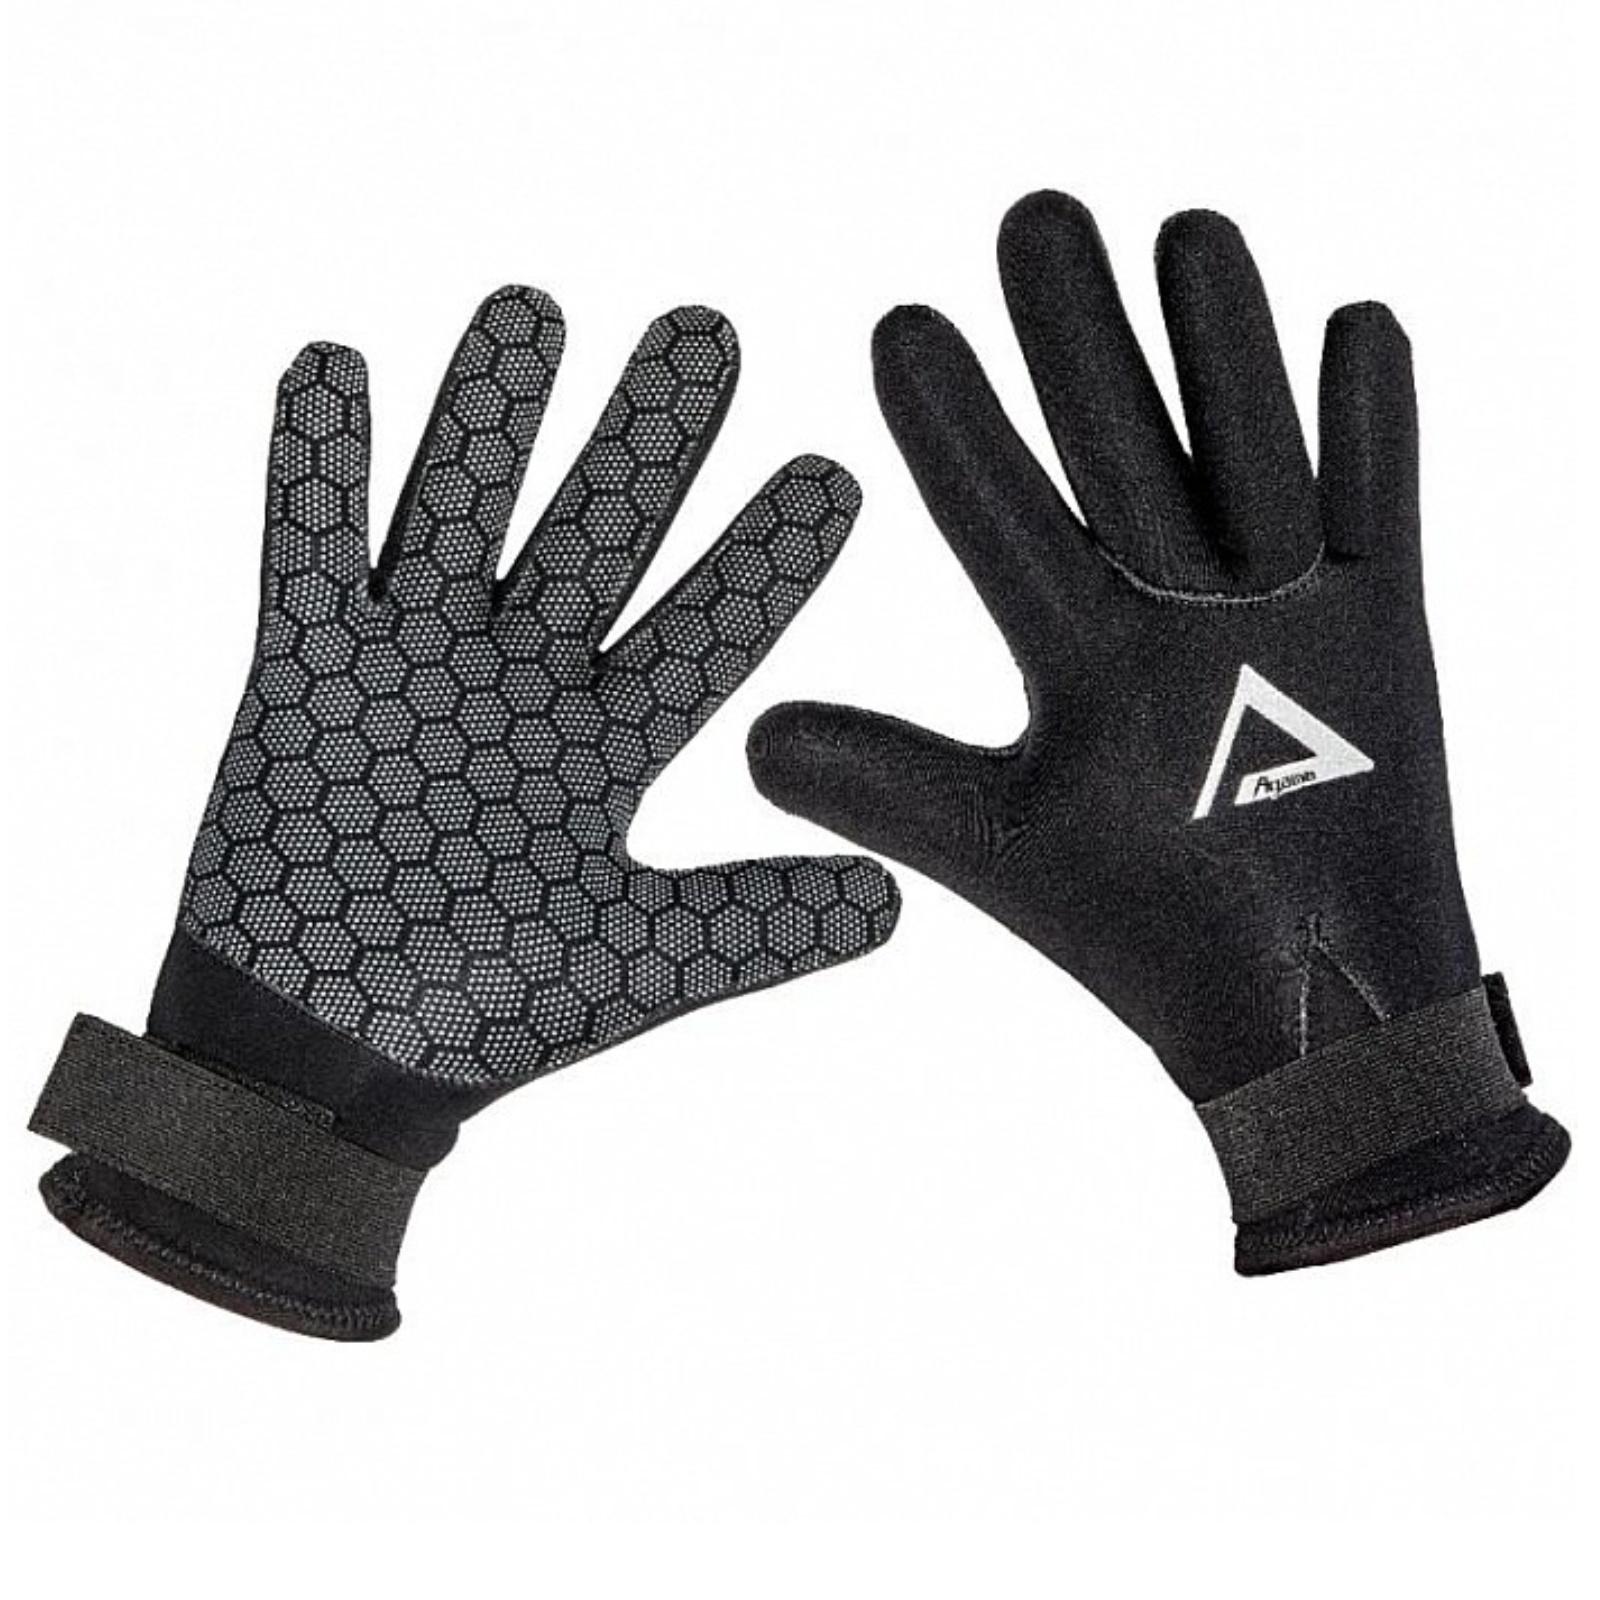 Neoprenové rukavice AGAMA Superstretch 5 mm